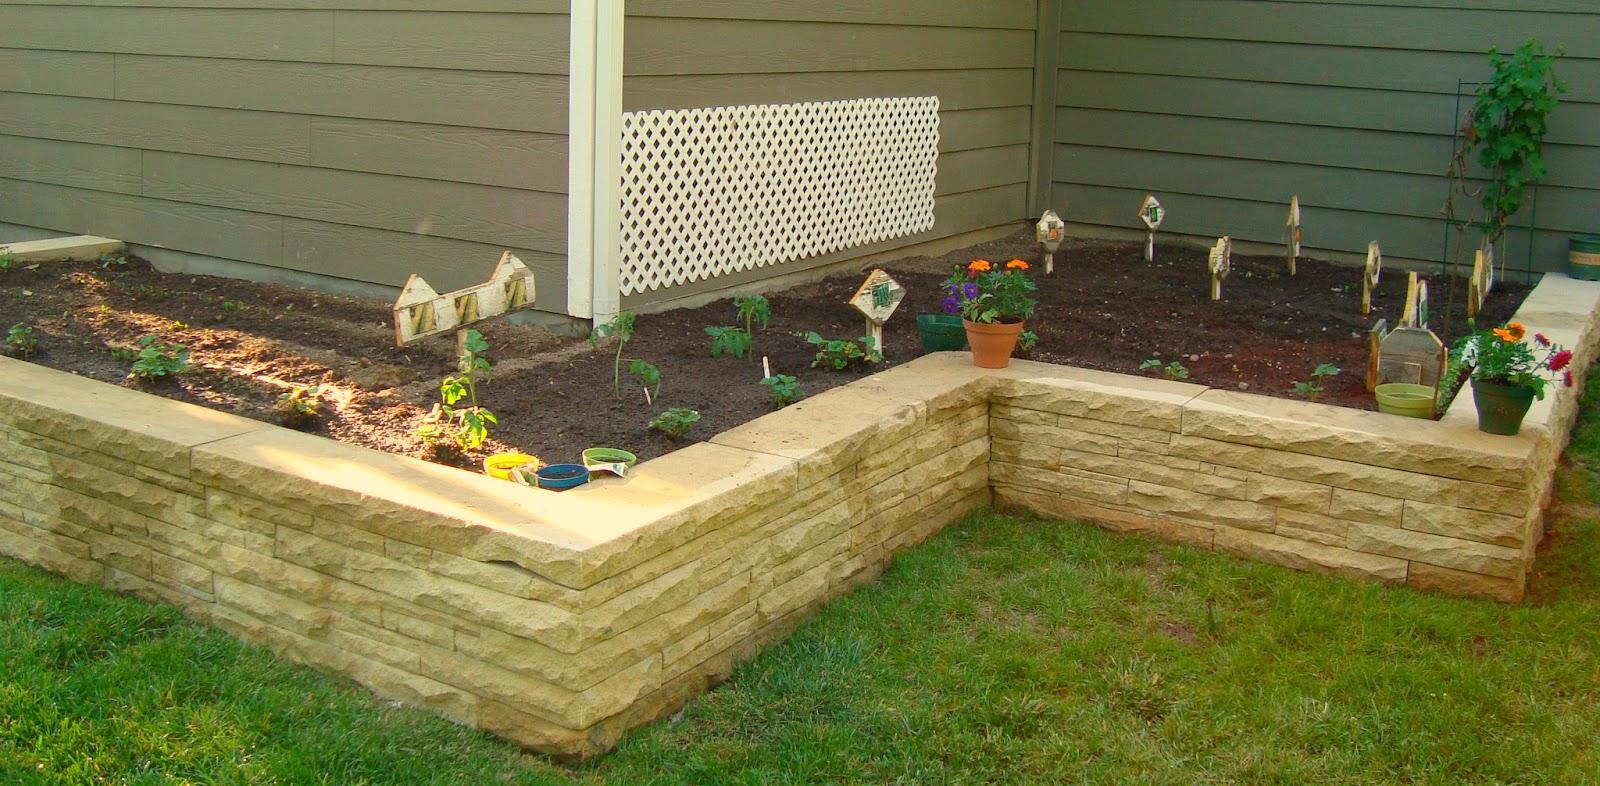 Crafty Savvy My garden